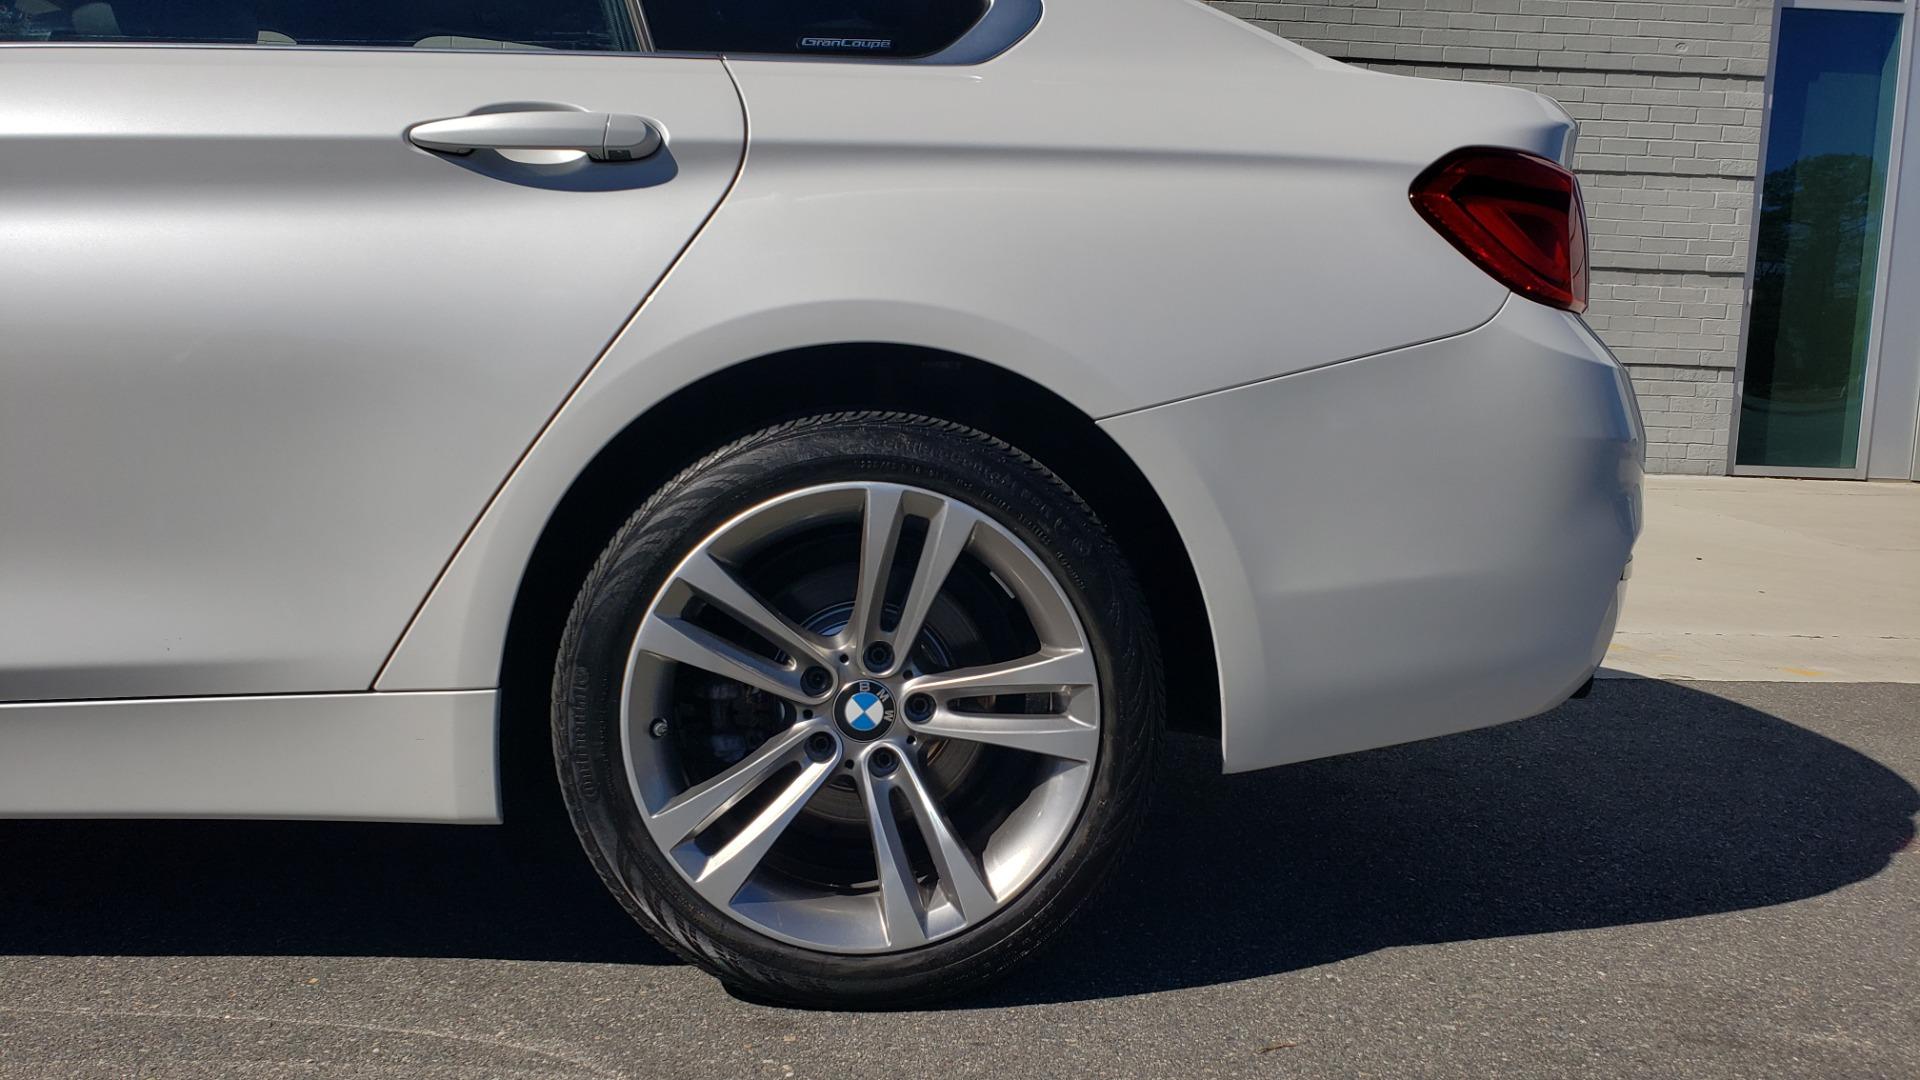 Used 2018 BMW 4 SERIES 430IXDRIVE / PREMIUM / NAV / SUNROOF / ESSENTIALS PKG for sale $28,995 at Formula Imports in Charlotte NC 28227 83